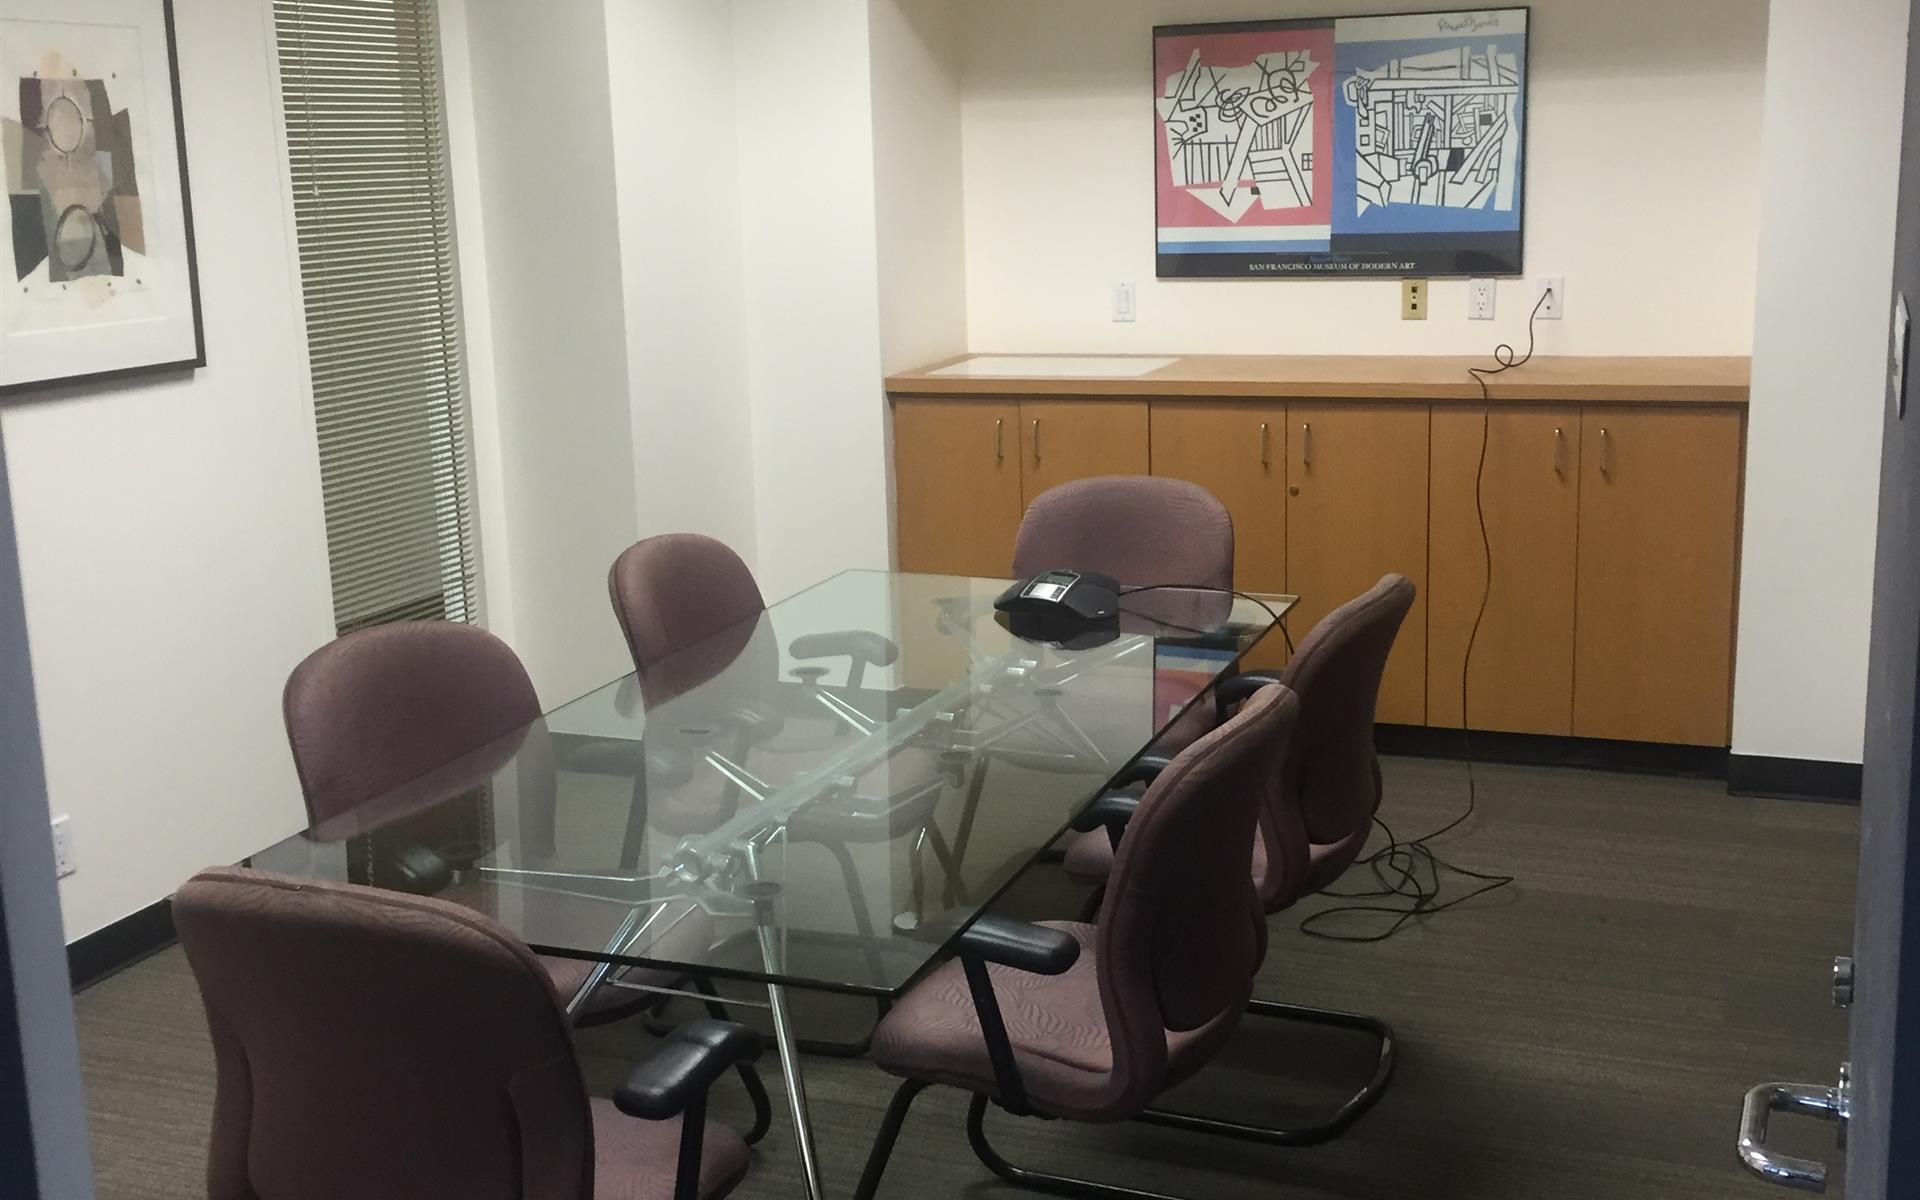 Renaissance Entrepreneurship Center - 3rd Floor Conference Room